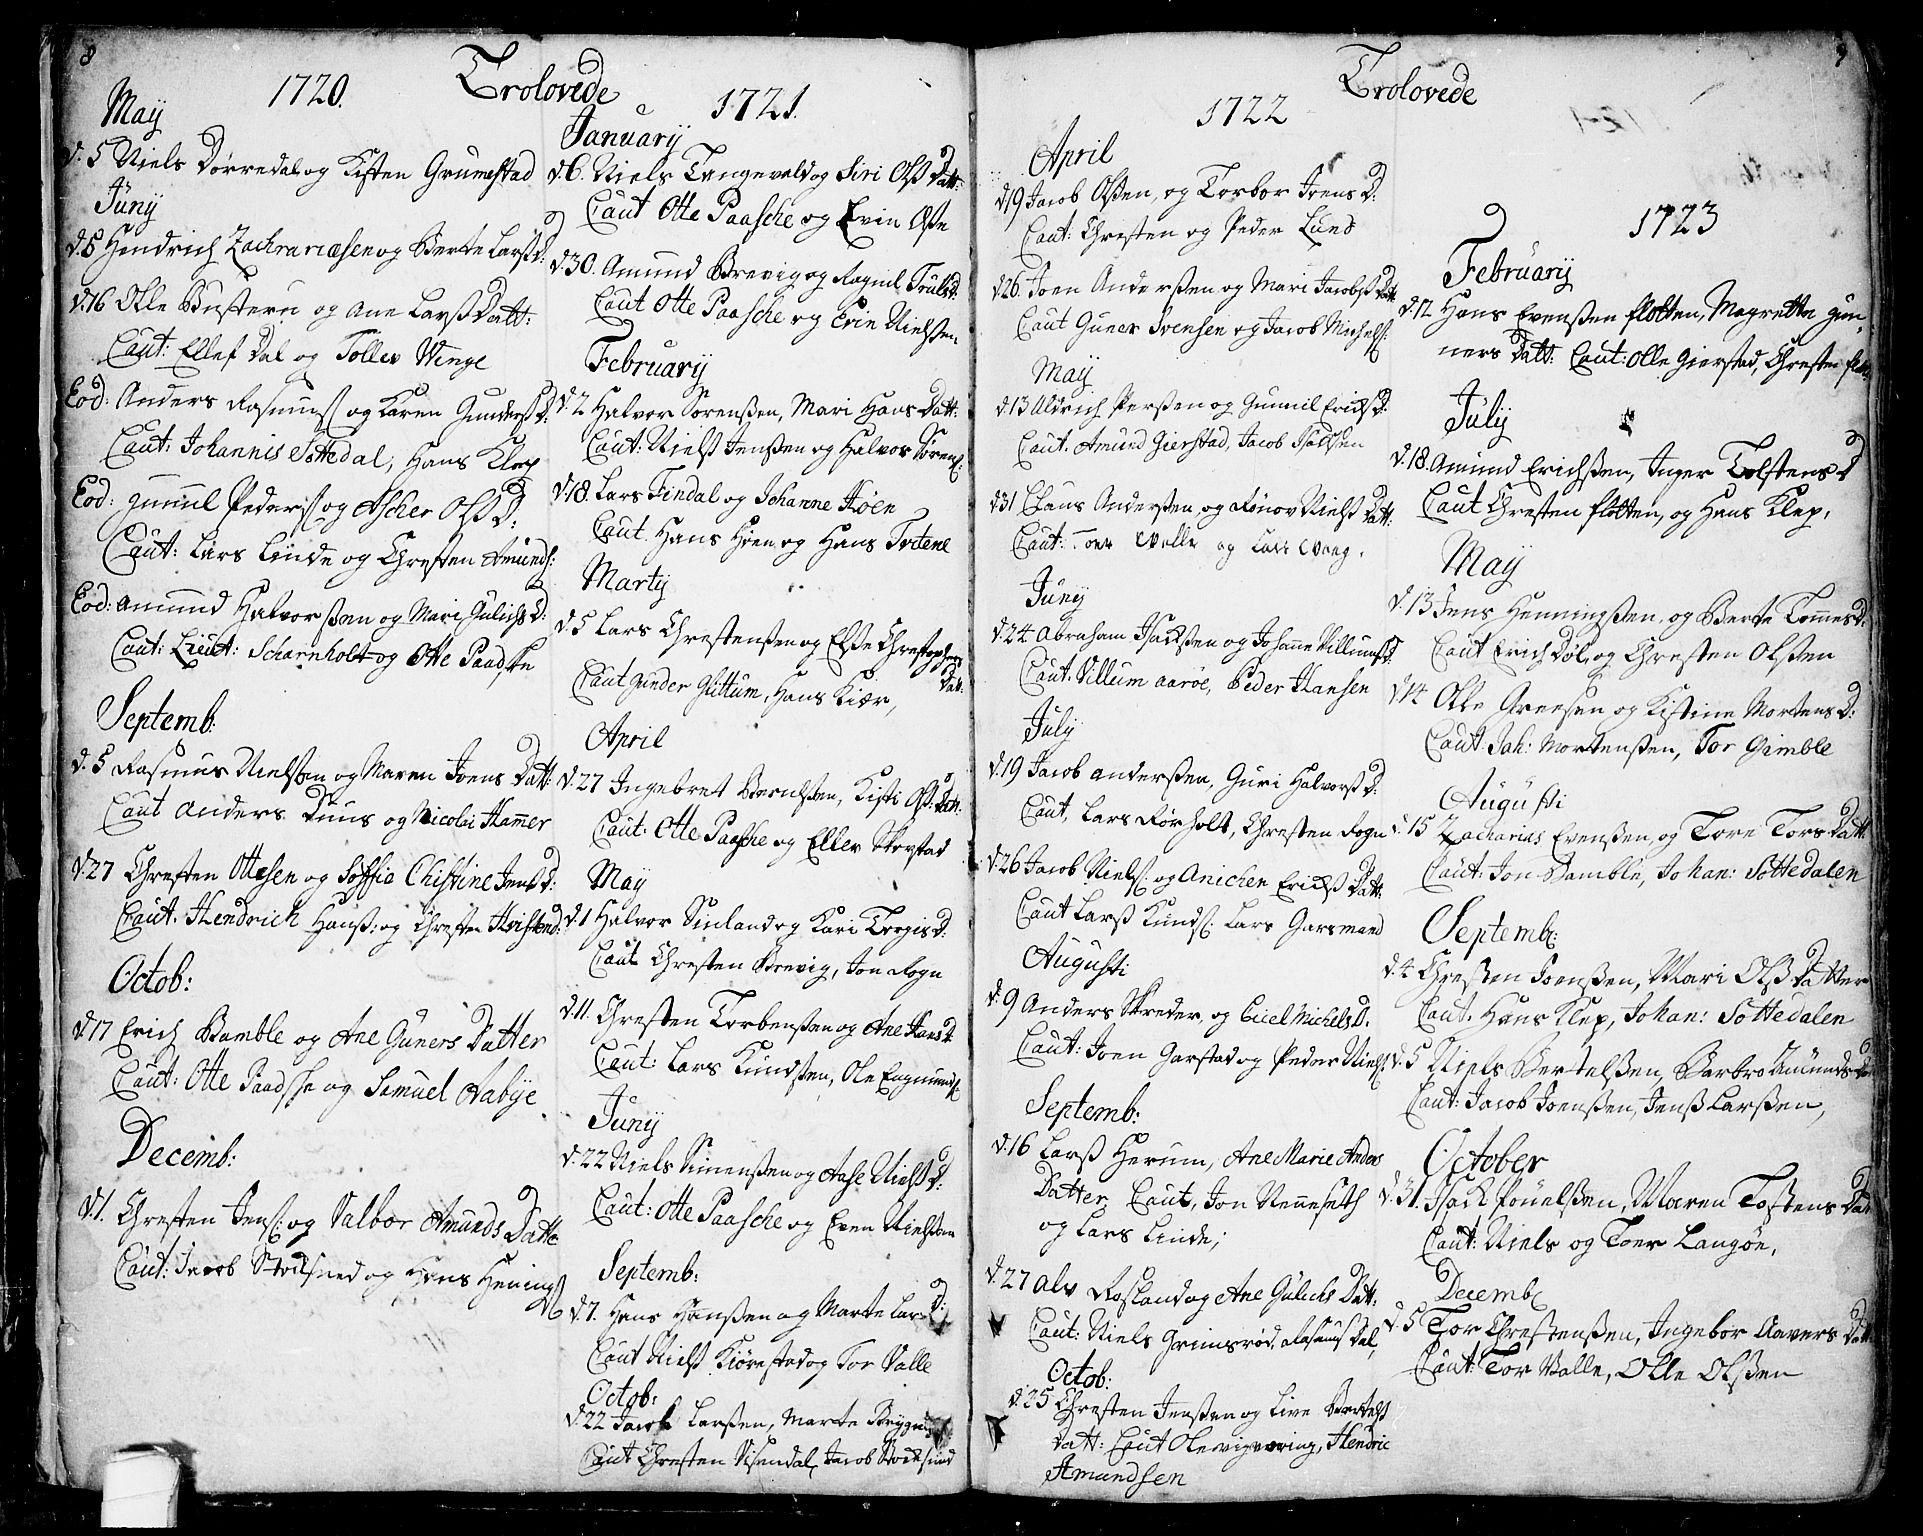 SAKO, Bamble kirkebøker, F/Fa/L0001: Ministerialbok nr. I 1, 1702-1774, s. 8-9